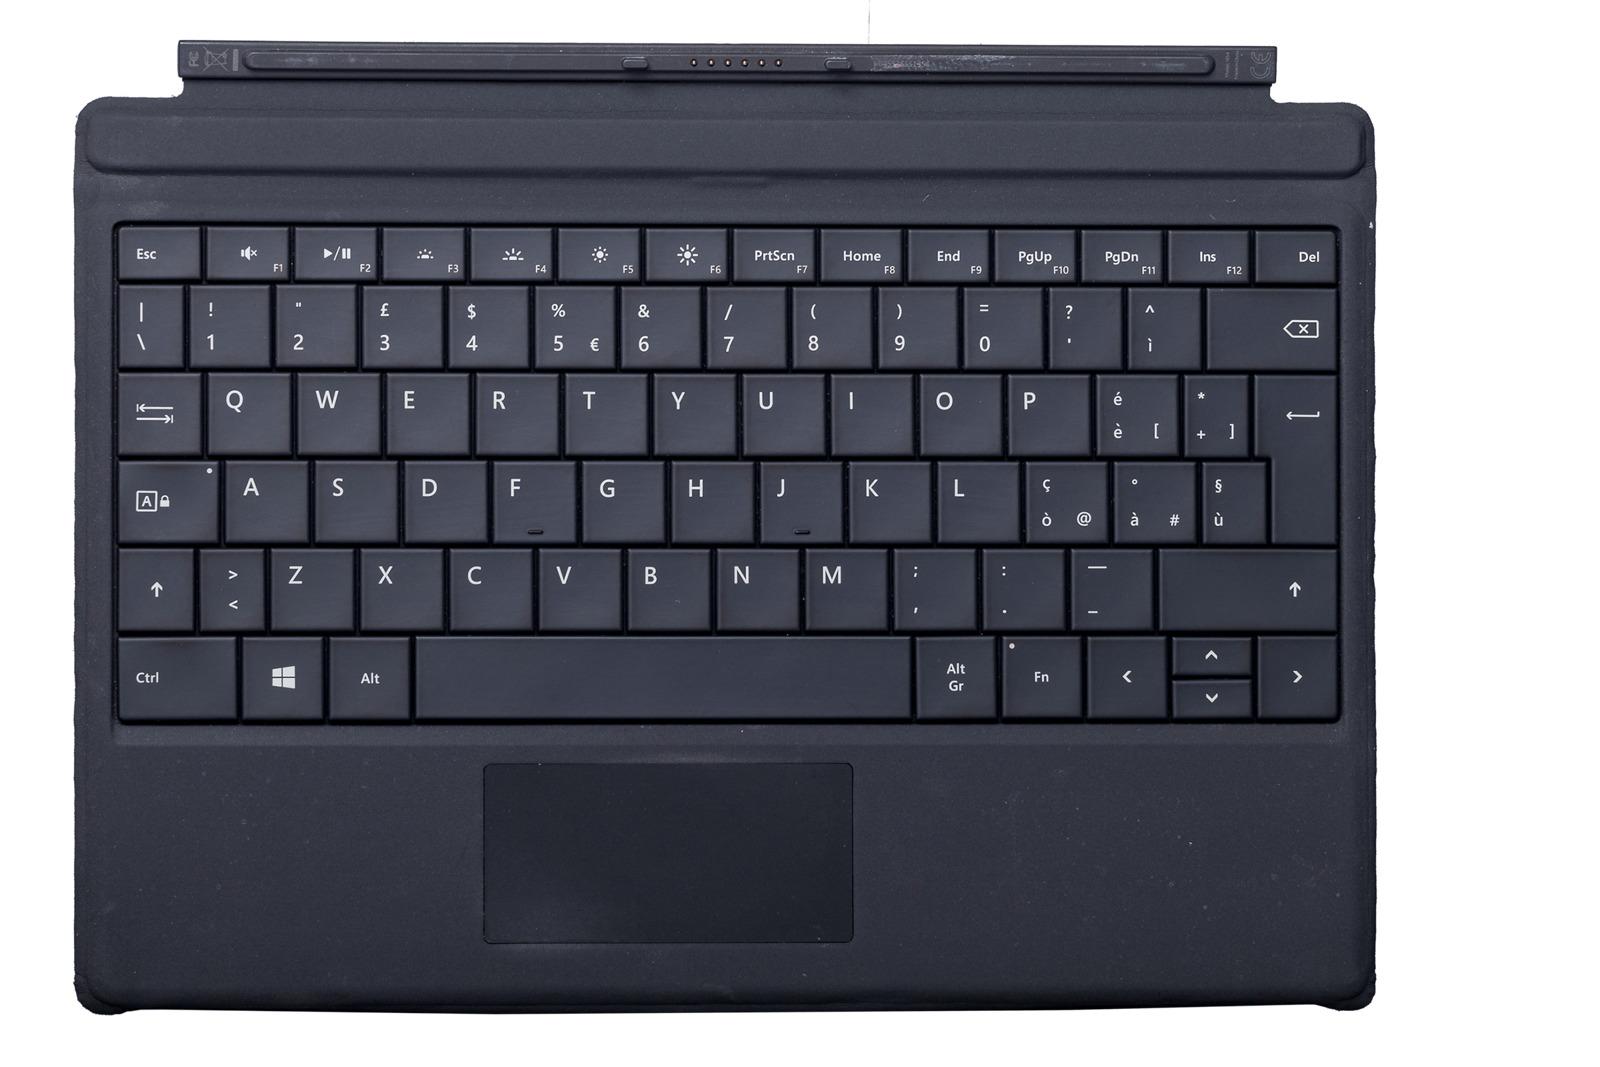 Keyboard Microsoft Surface Type Cover 3 Black QWERTY (Italian) Grade C